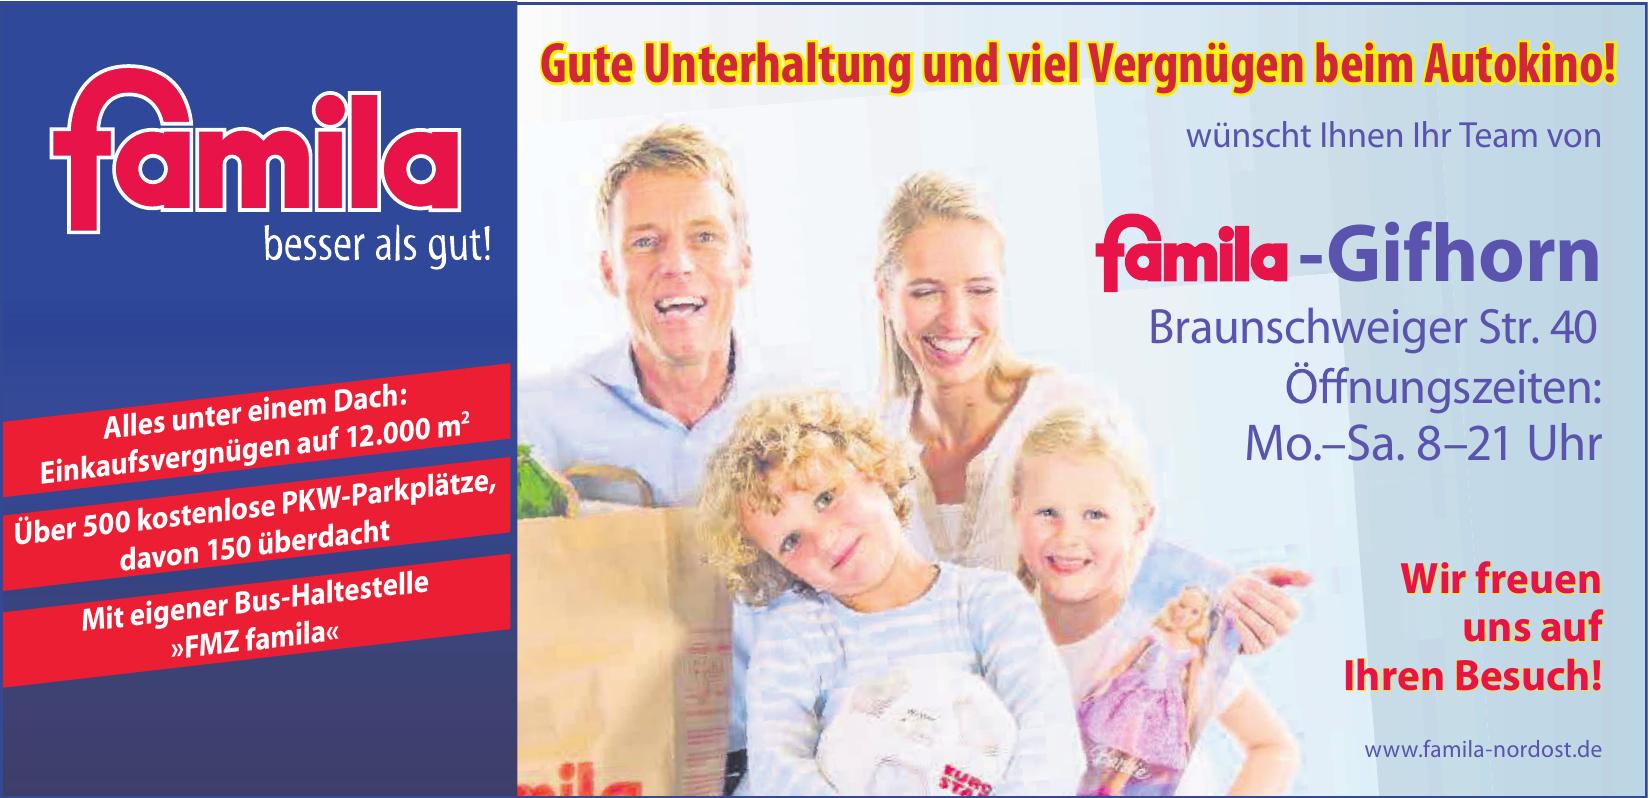 Famila-Gifhorn